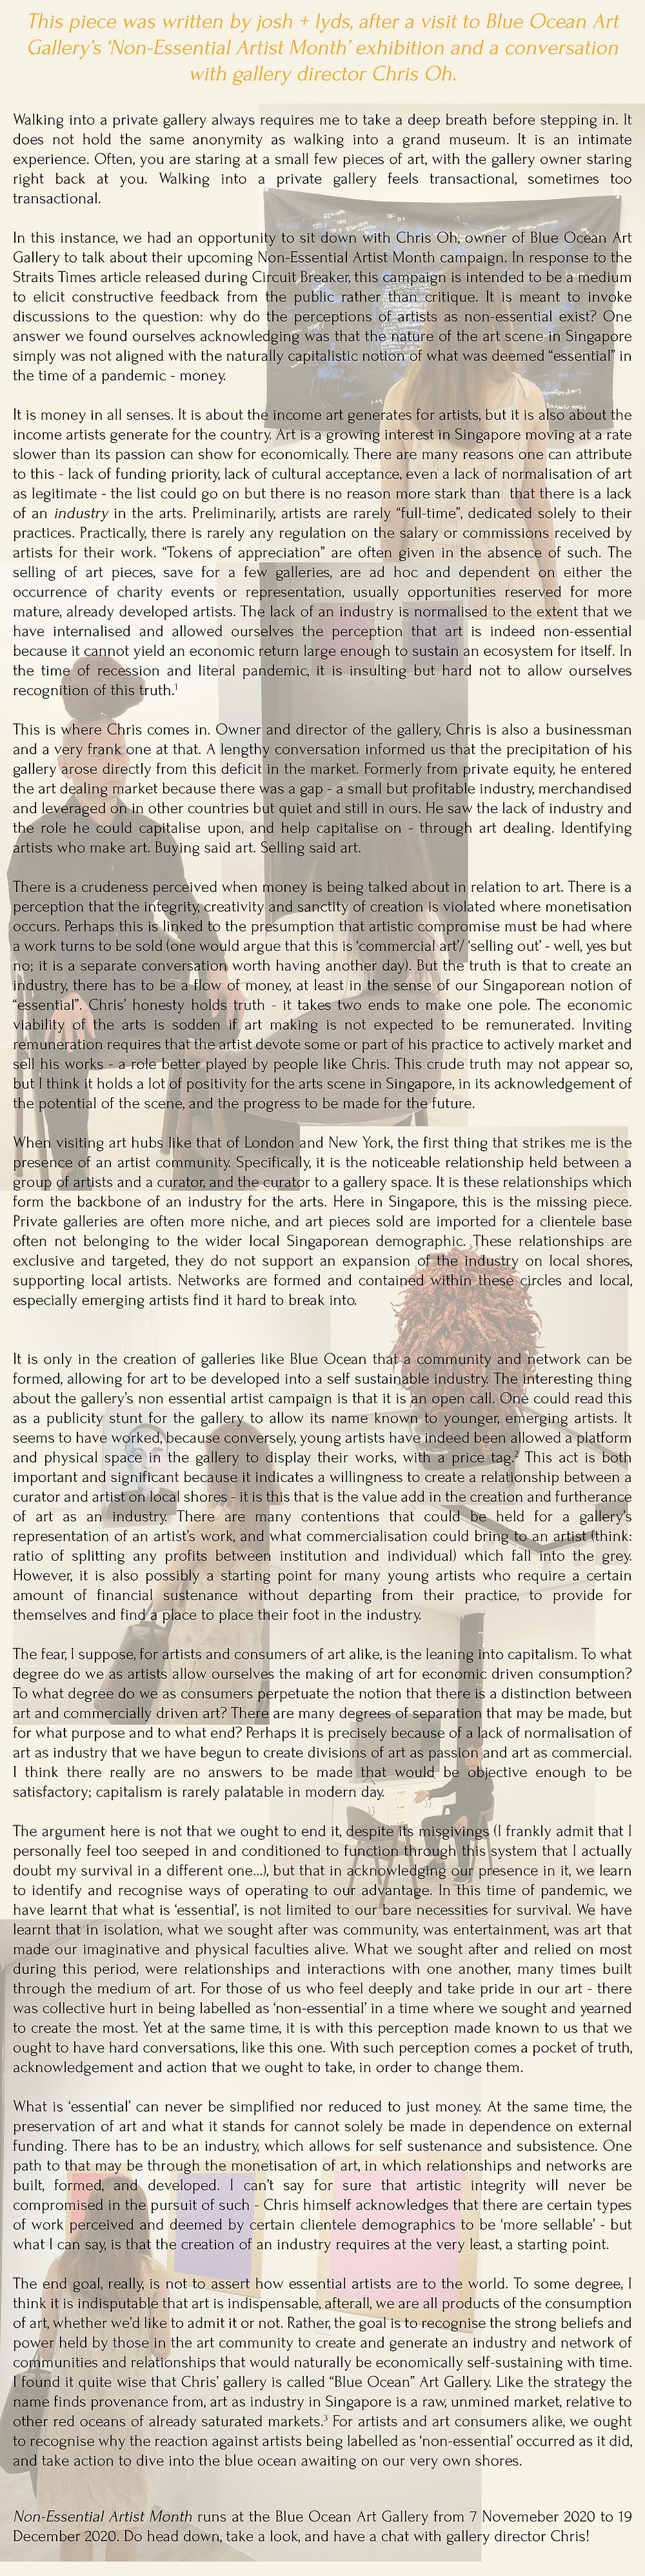 blurb magazine. blurbmag. Ruminations on art as non-essential. josh + lyds. arts & culture. @blurb.mag